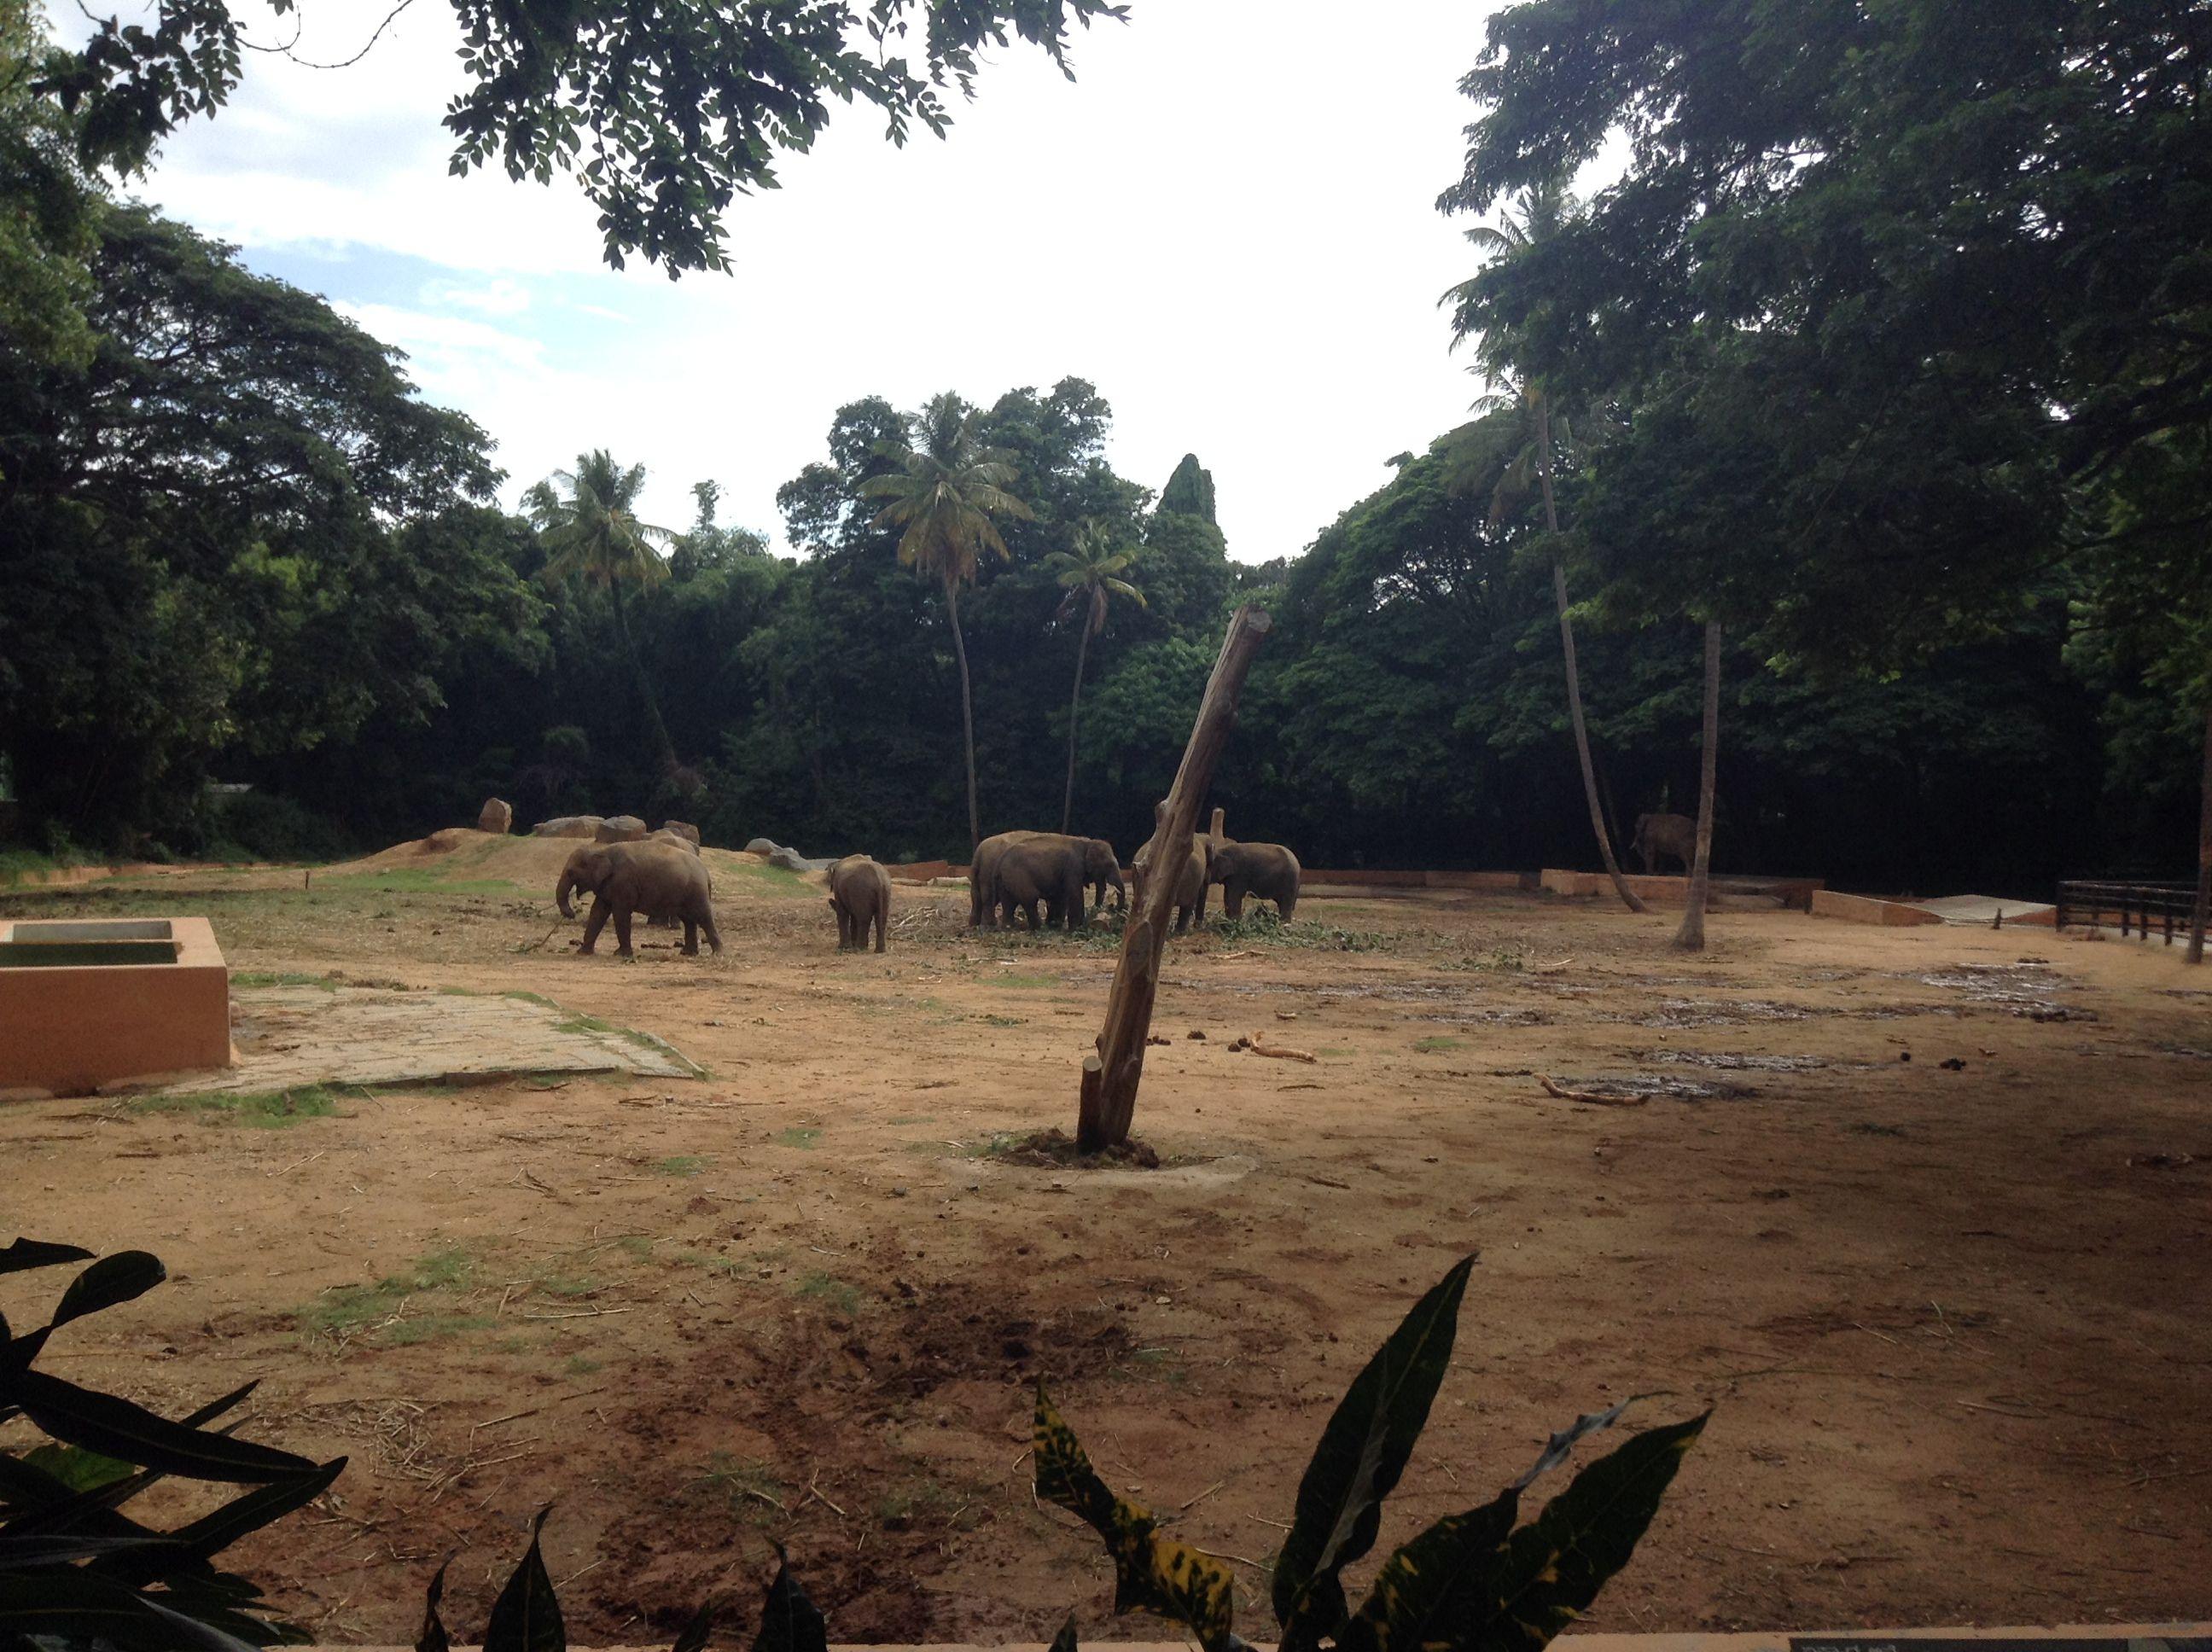 4cb05f292ec492ab94beb5e9600c45d8 - Mysore Zoo Sri Chamarajendra Zoological Gardens